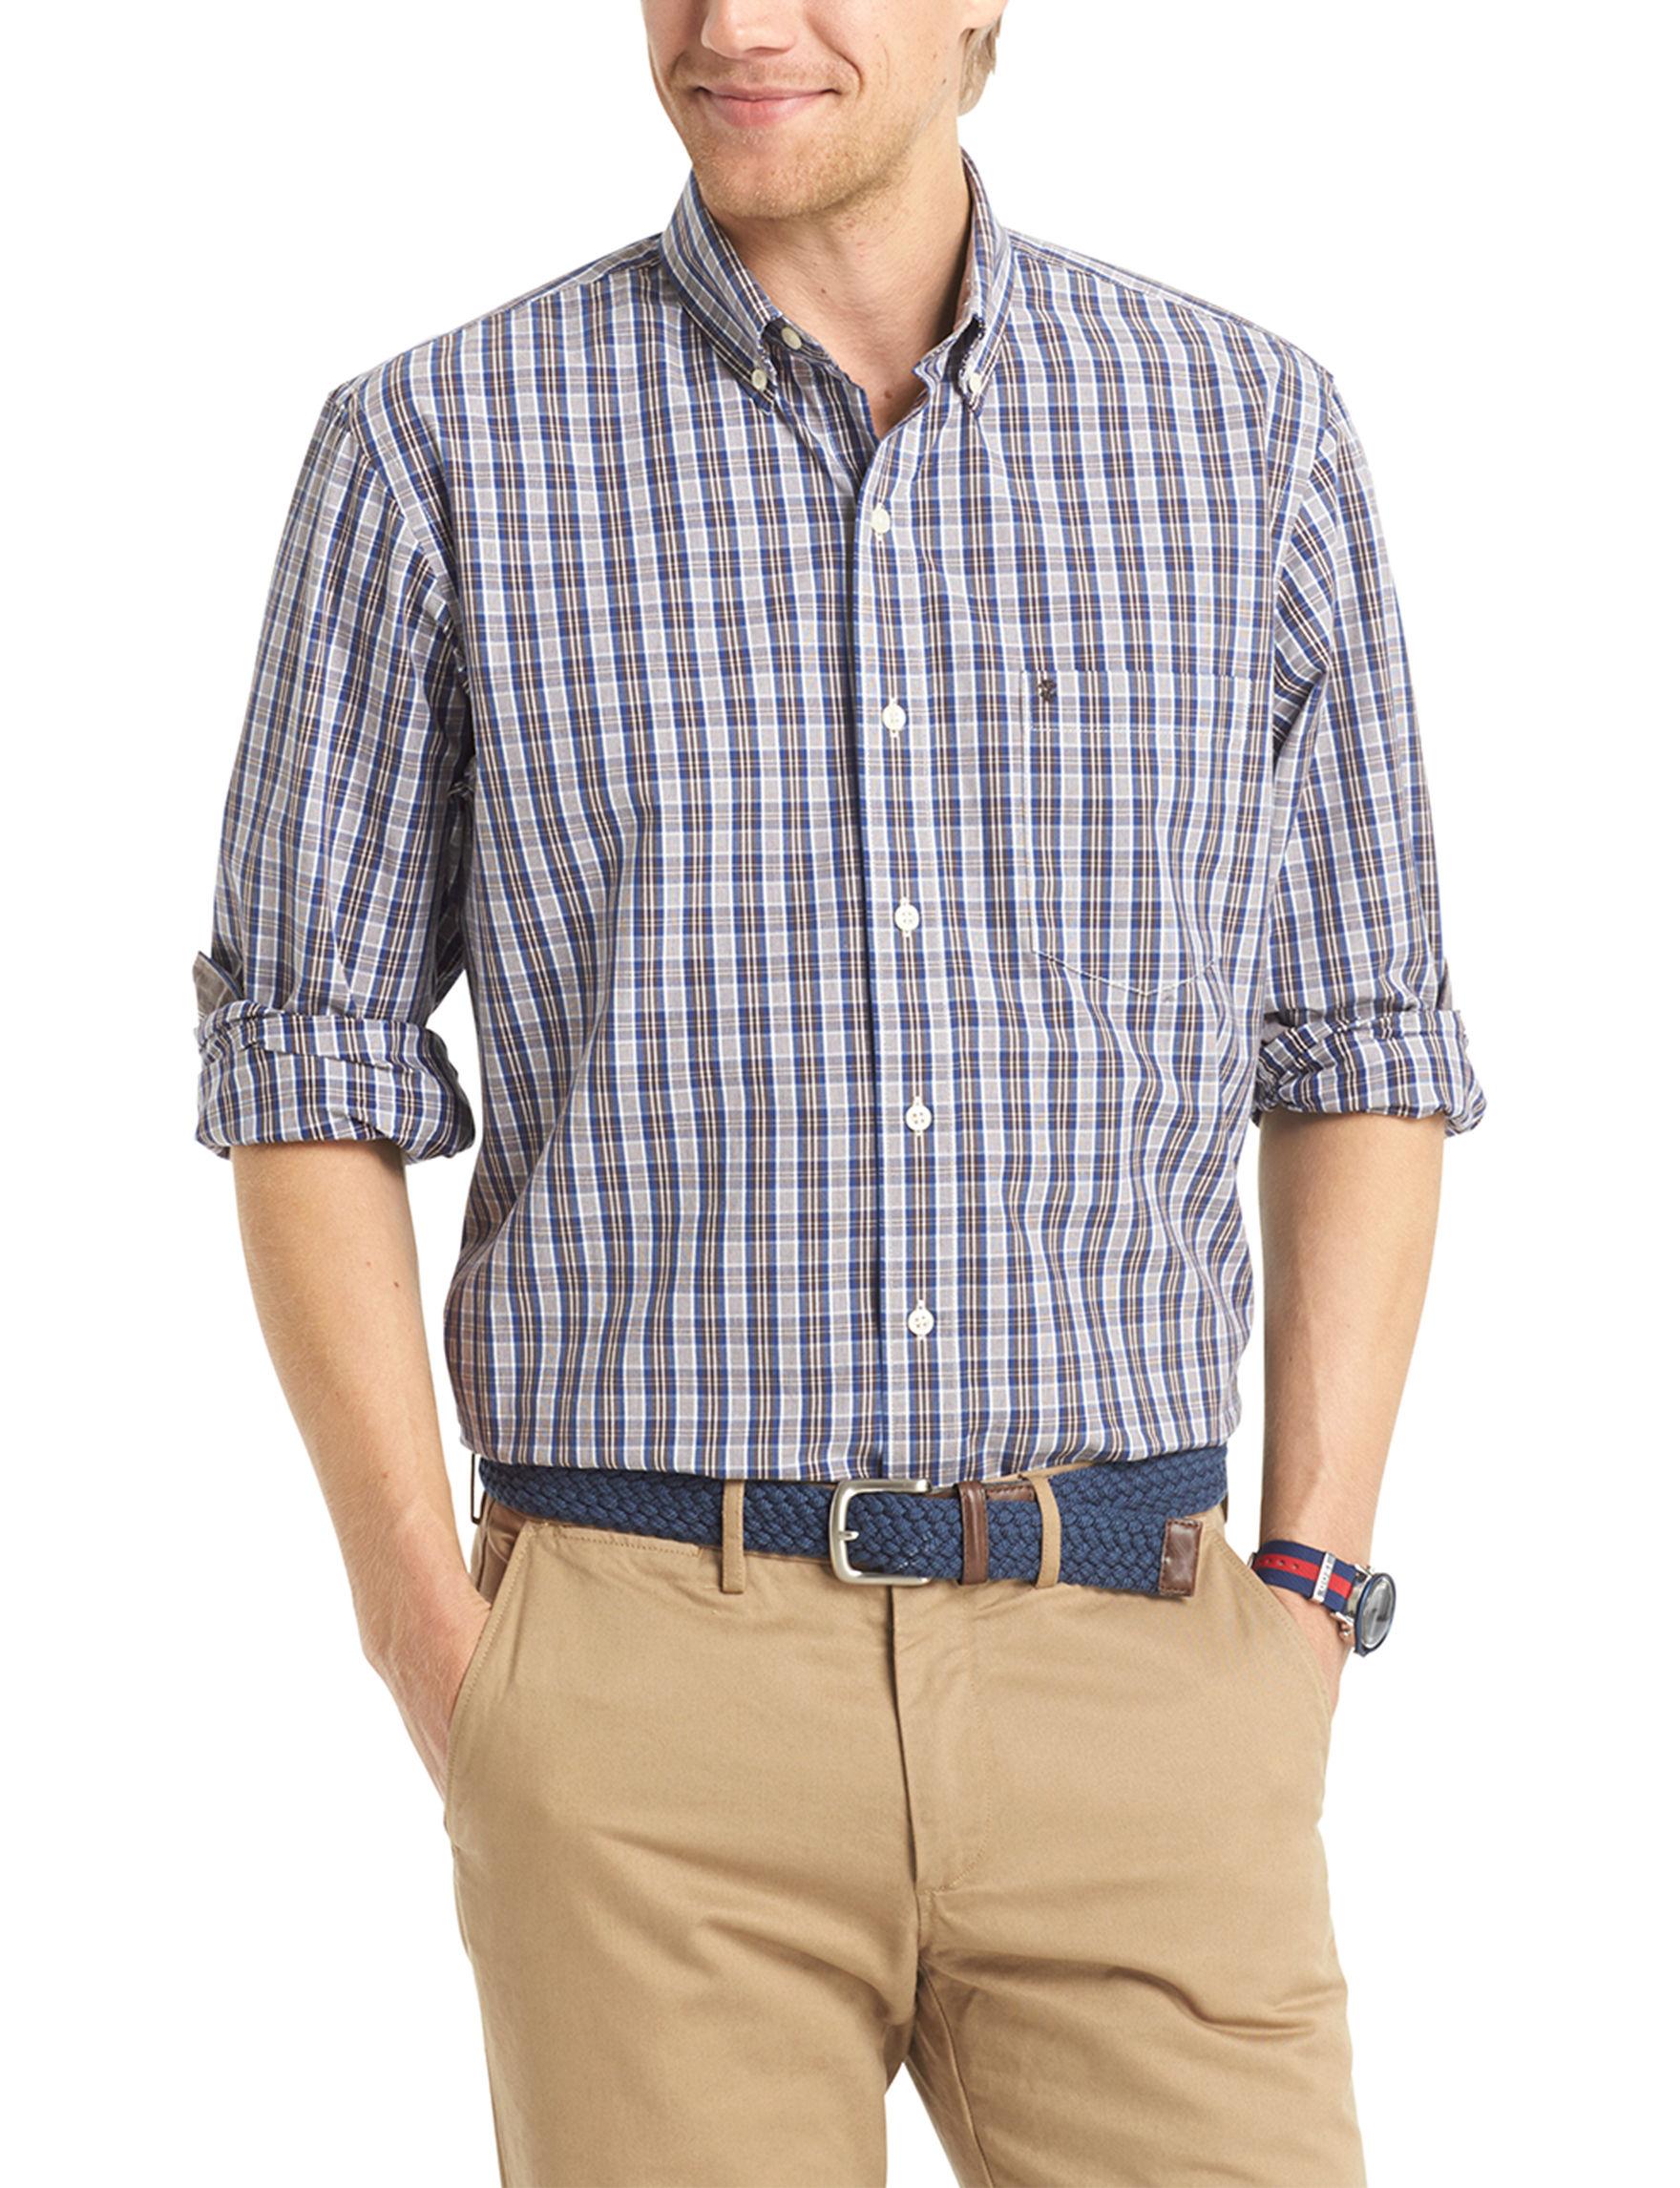 Izod Java Casual Button Down Shirts